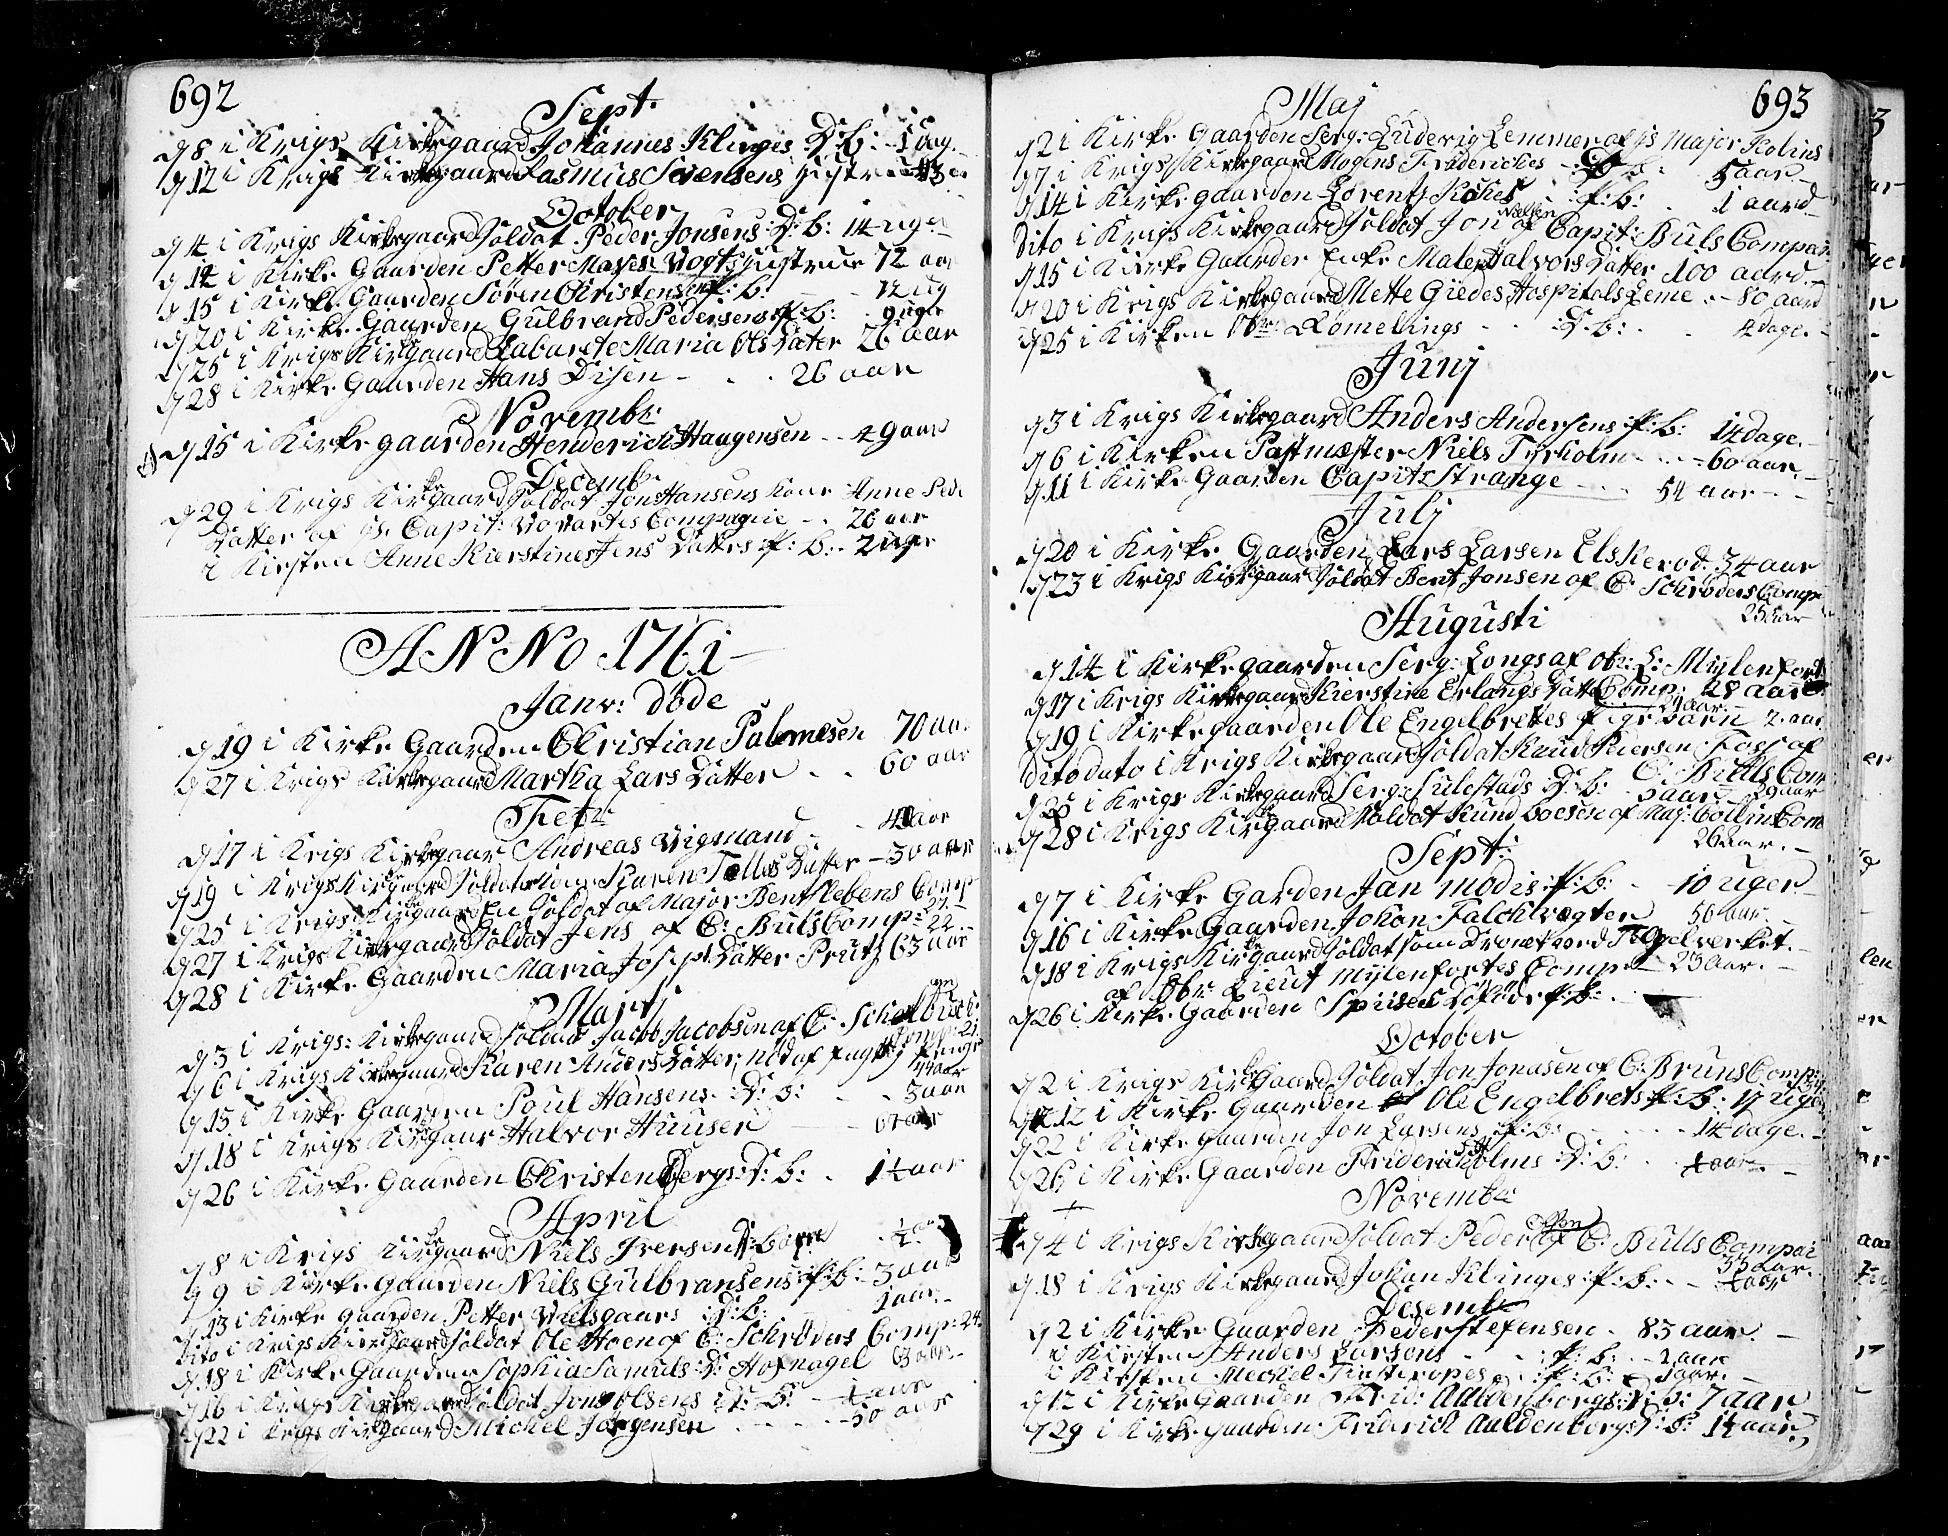 SAO, Fredrikstad prestekontor Kirkebøker, F/Fa/L0002: Ministerialbok nr. 2, 1750-1804, s. 692-693